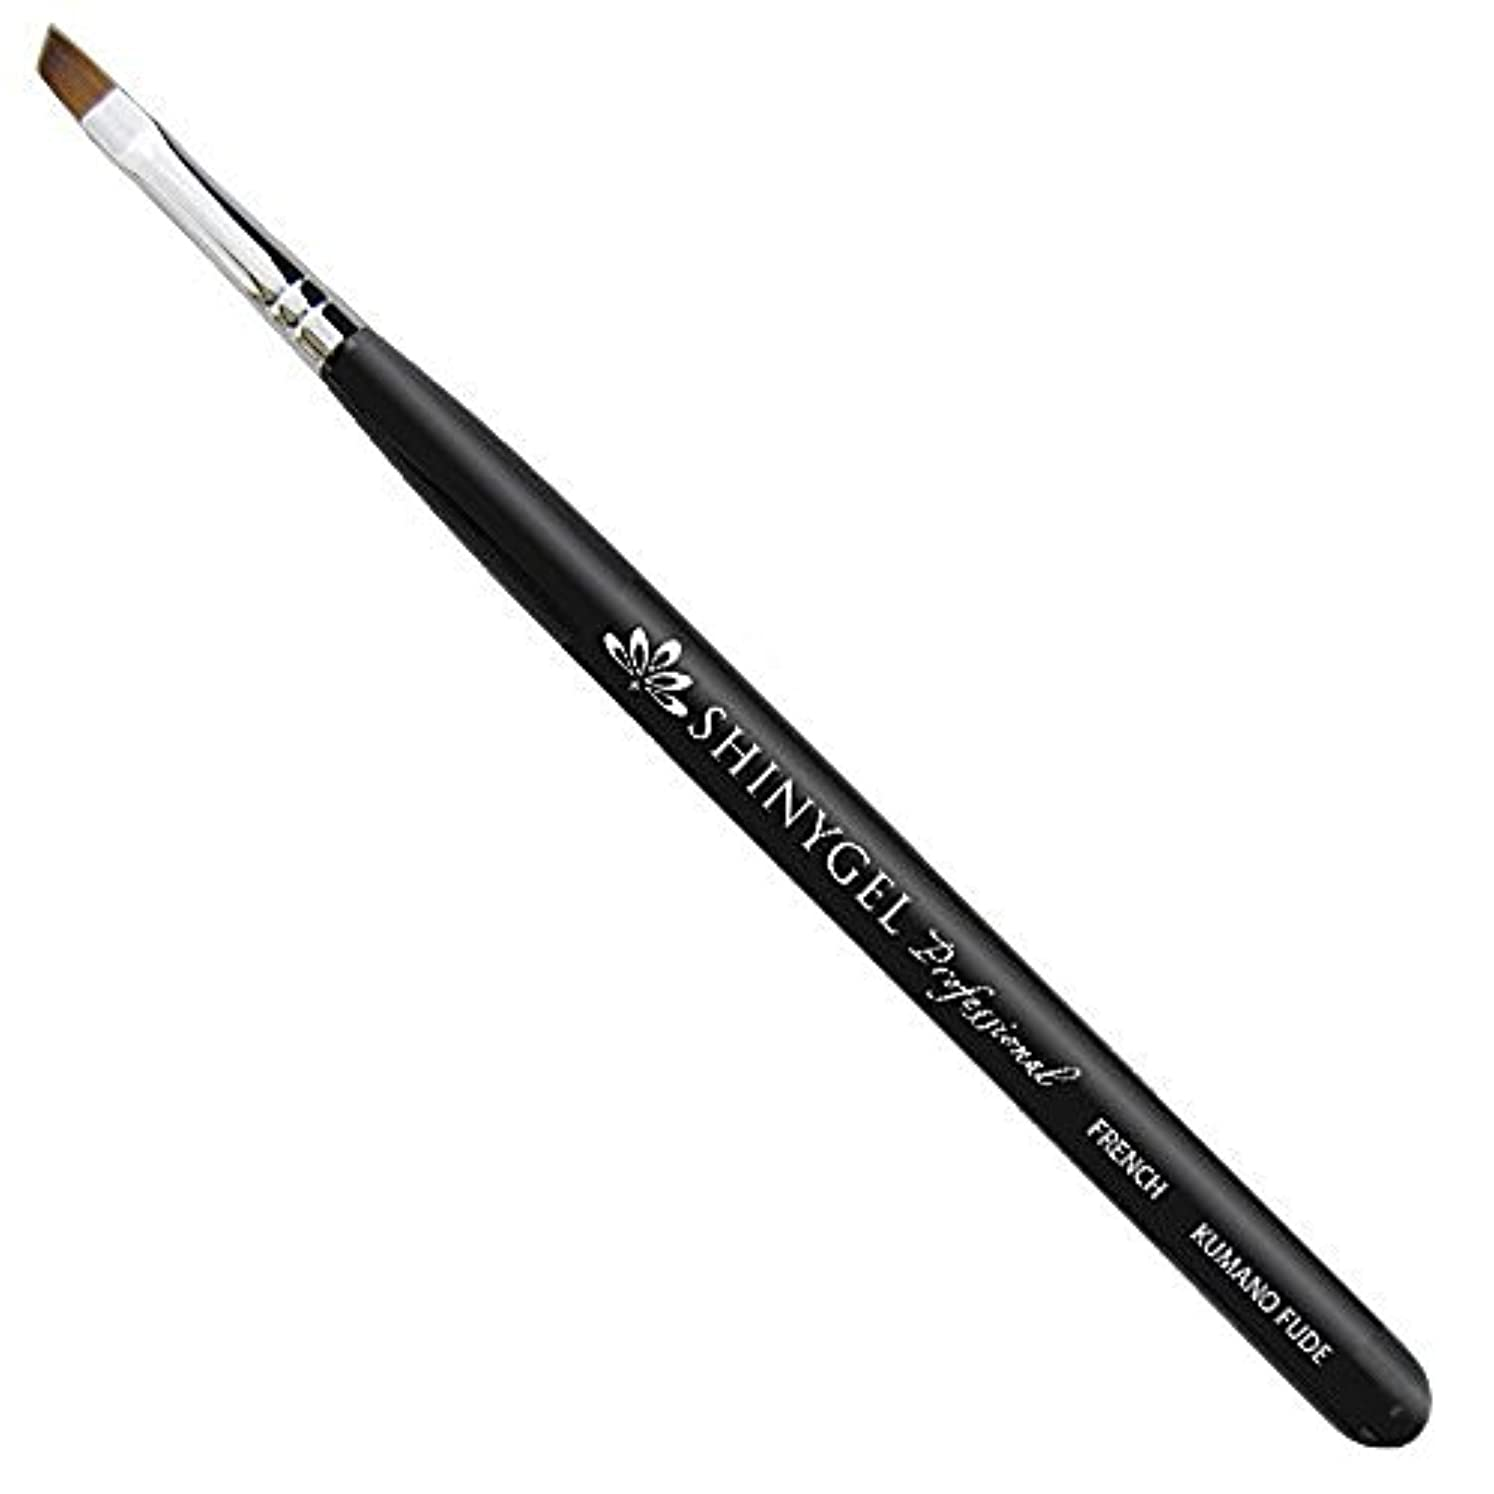 SHINY GEL ジェルブラシ フレンチ 熊野筆